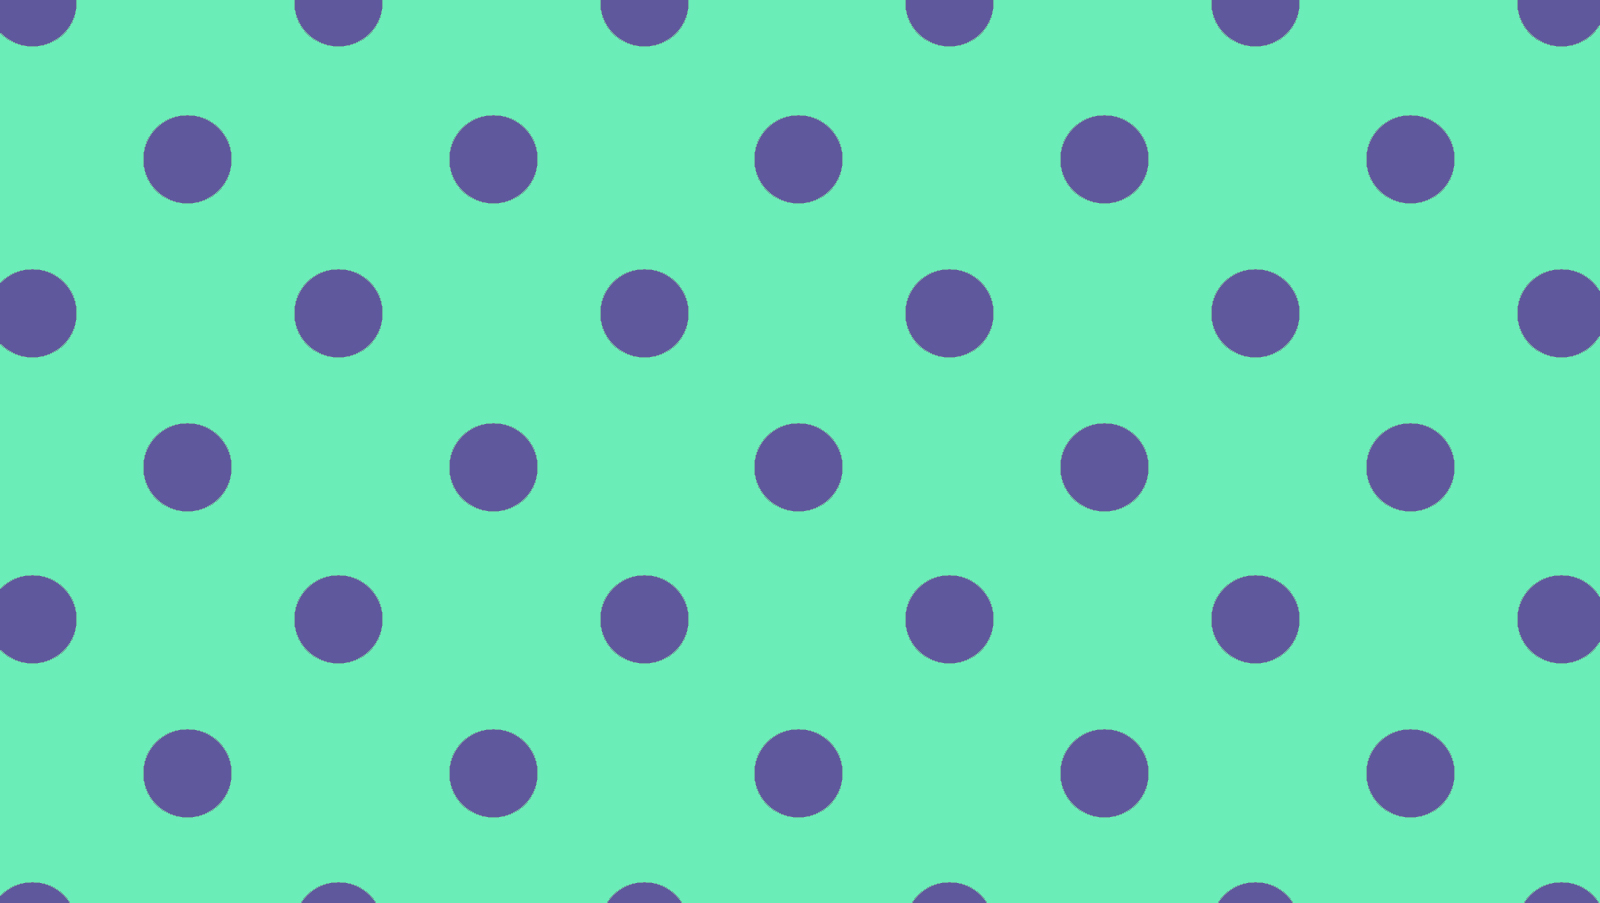 Polka dot pattern clipart svg freeuse Free Polka Dot, Download Free Clip Art, Free Clip Art on ... svg freeuse